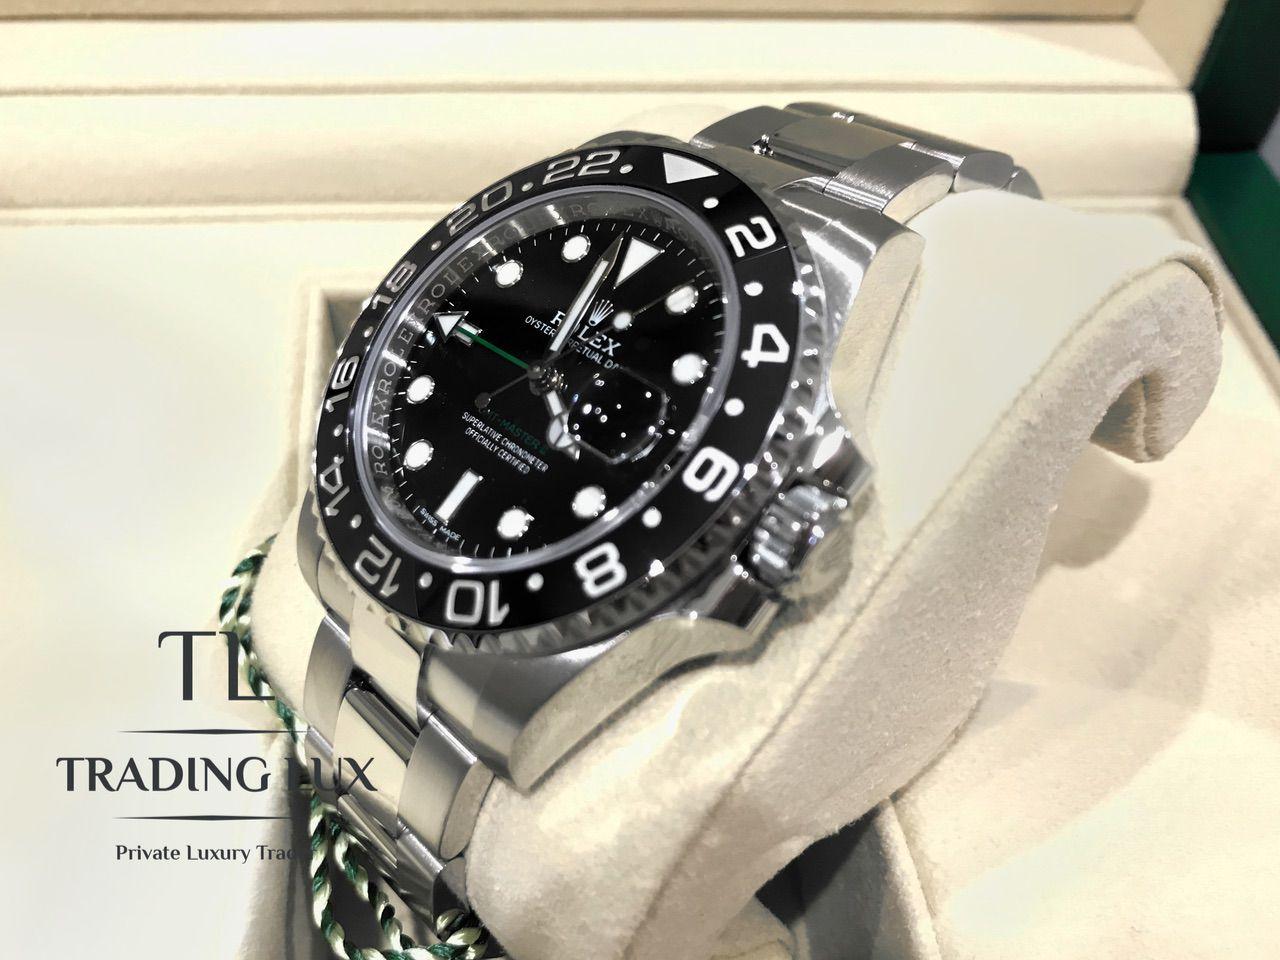 Rolex-GMT-Master-II-116710ln-8